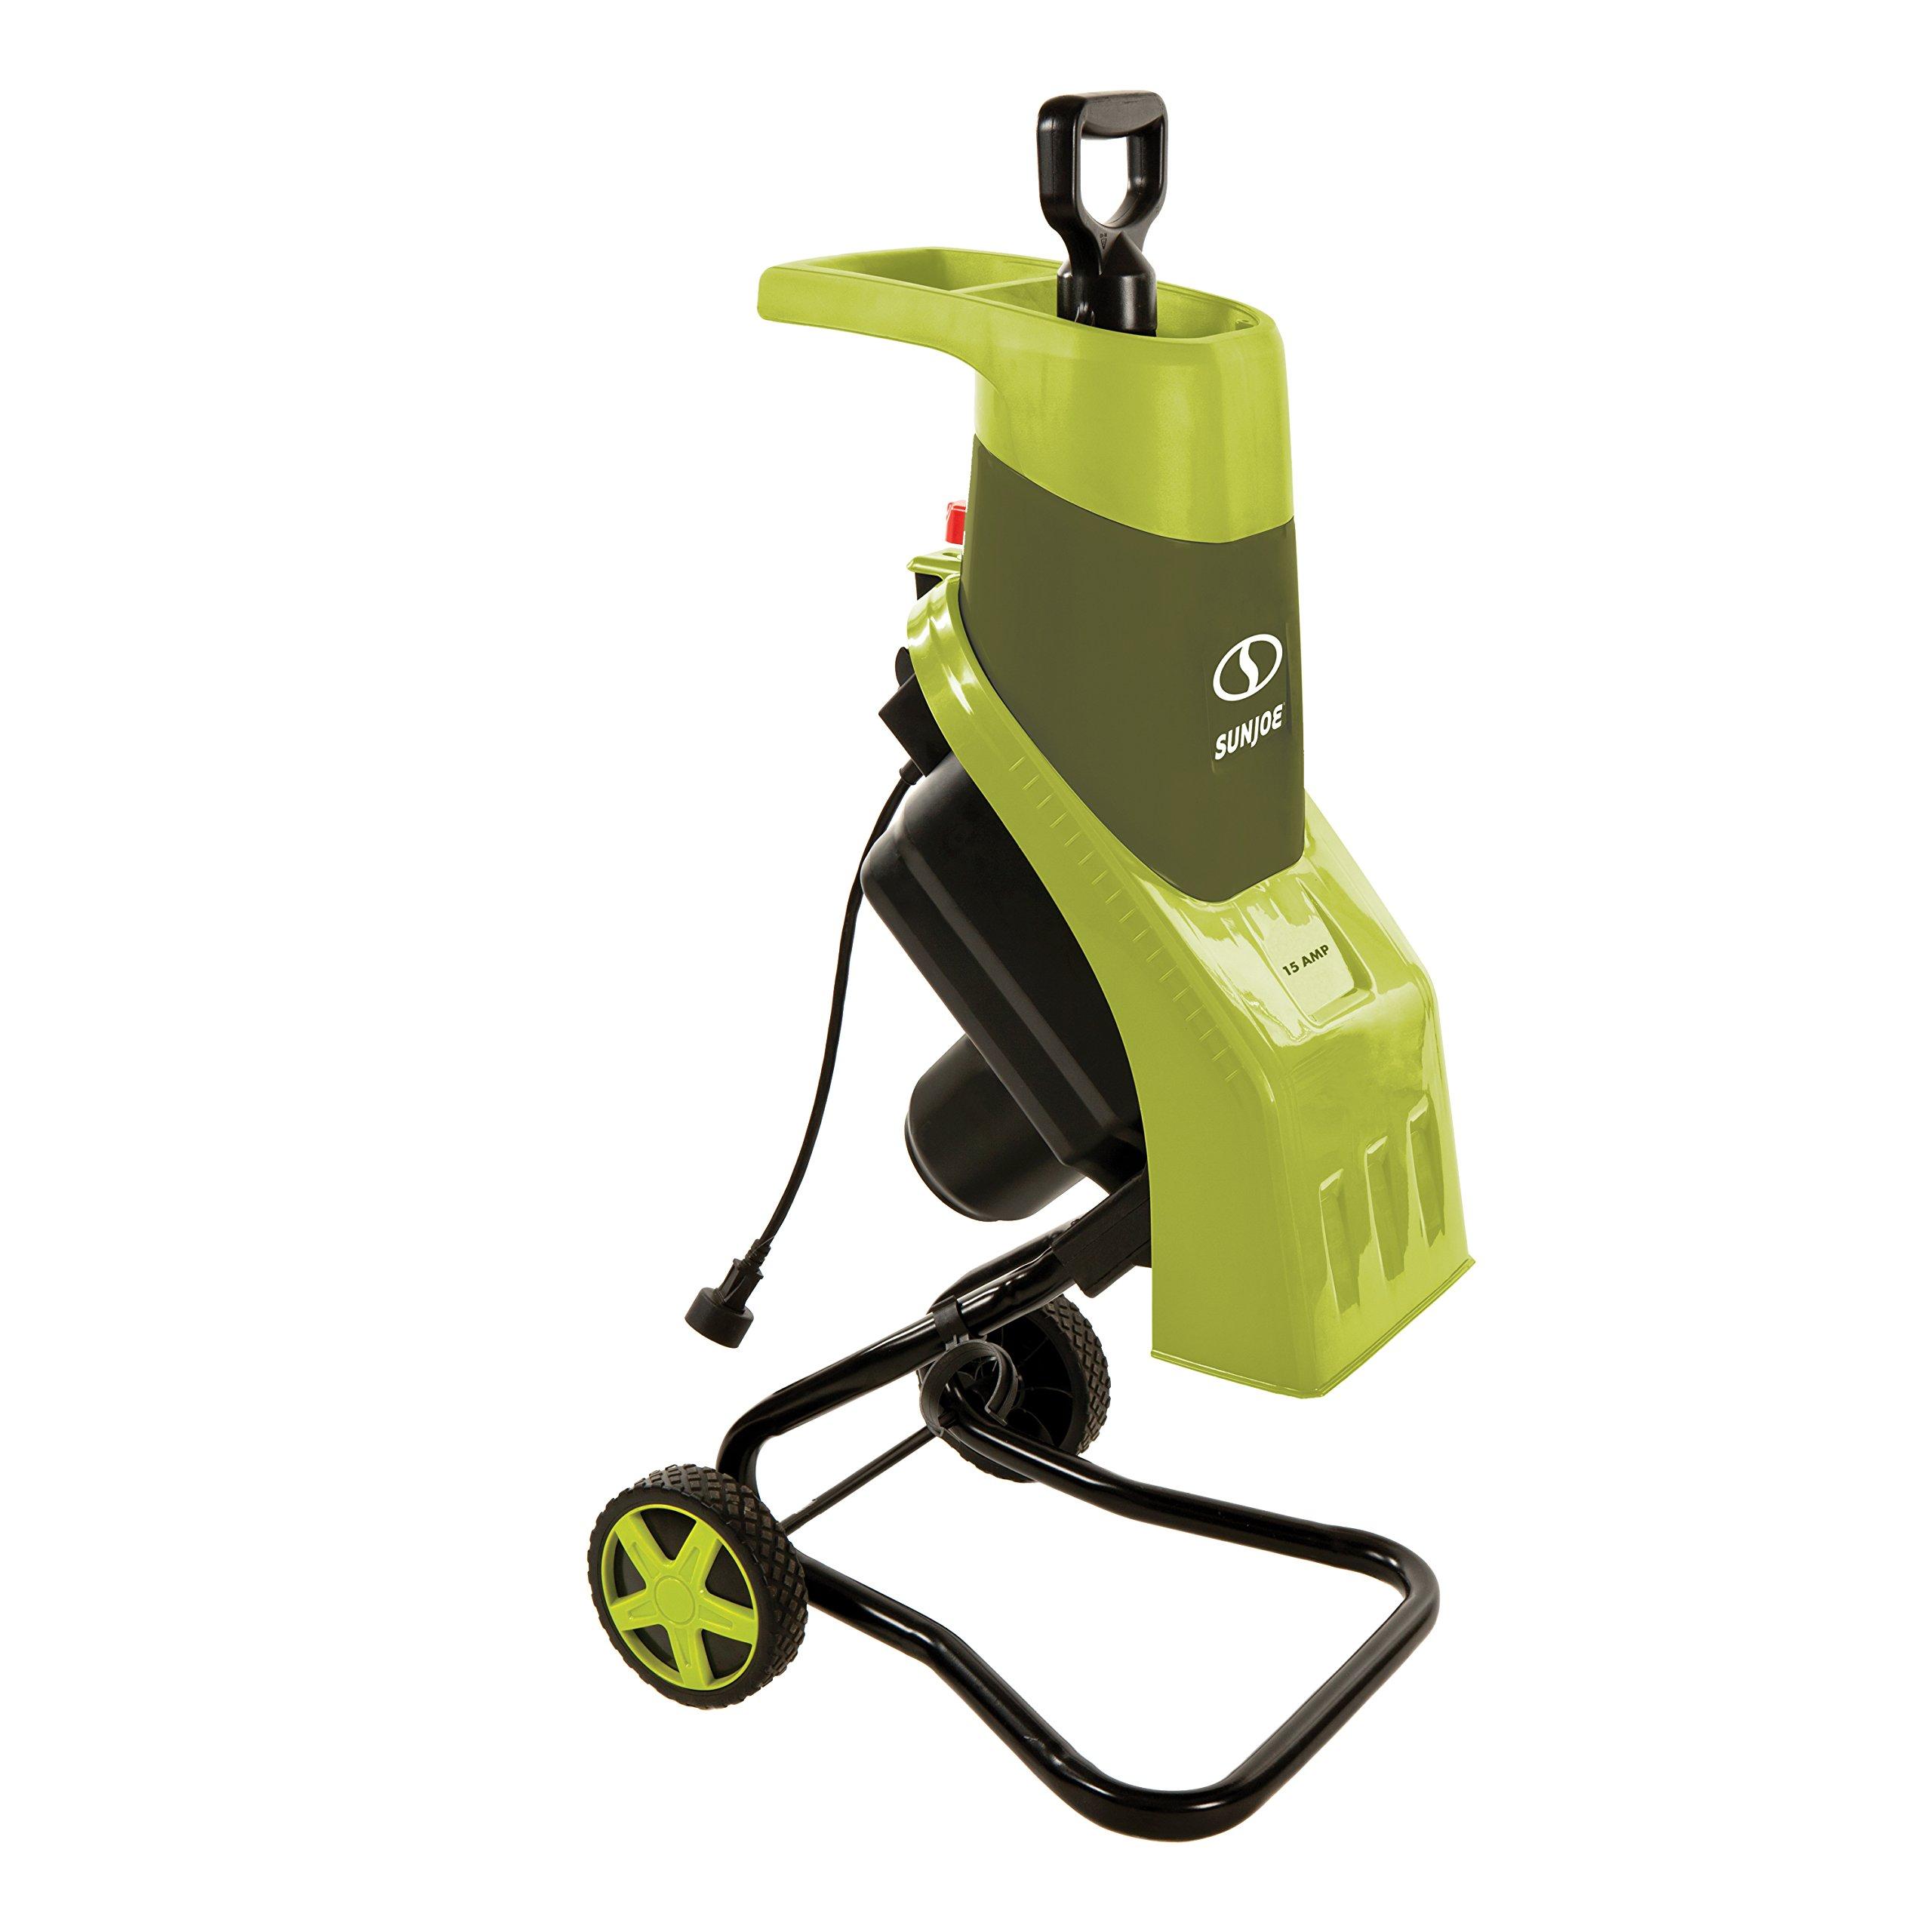 Sun Joe CJ602E-RM Electric Wood Chipper   17:1 Reduction   15 Amp (Renewed) (Colors May Vary)